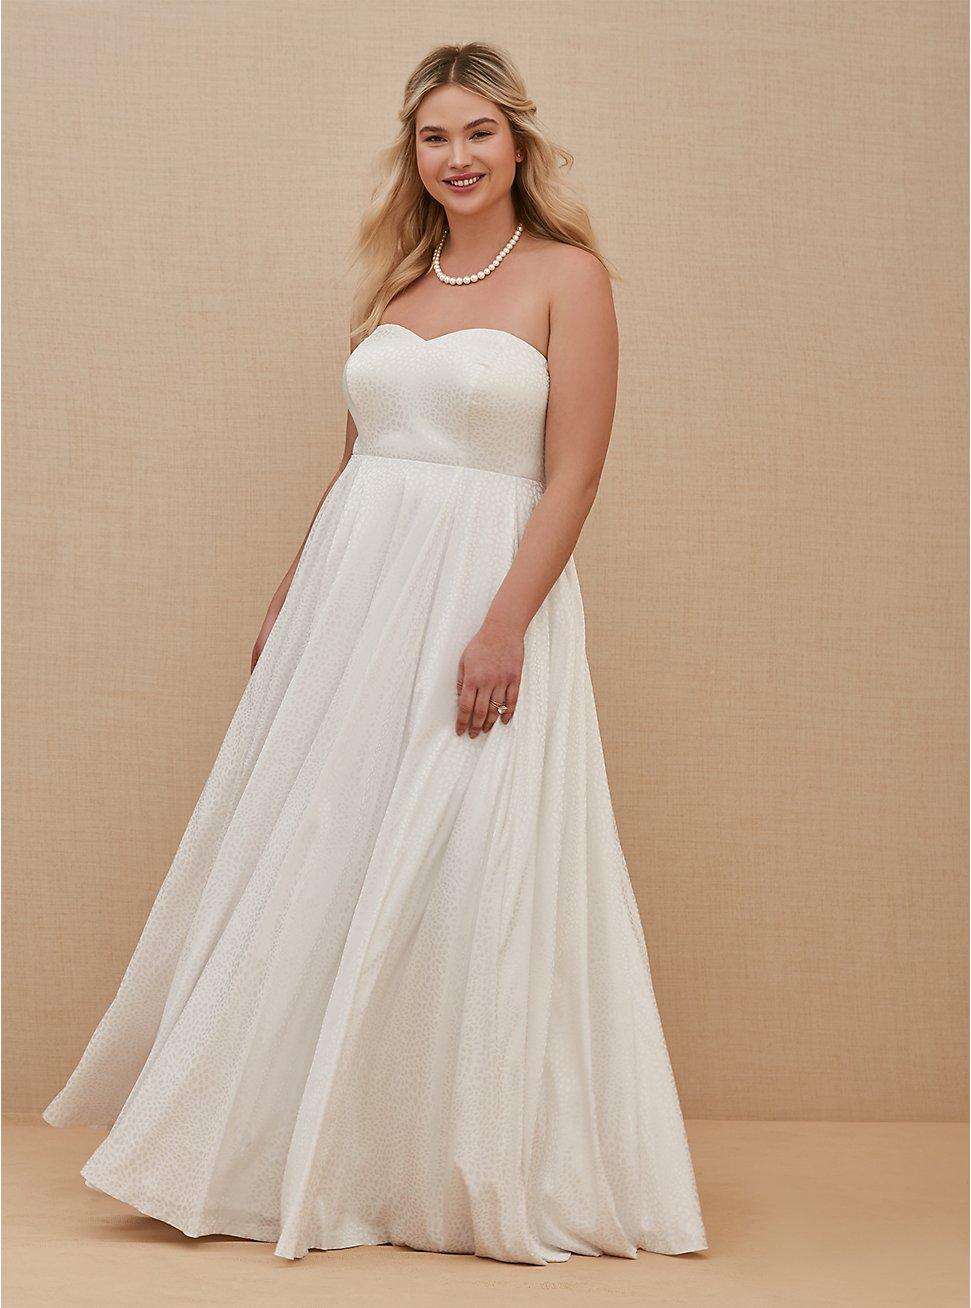 White Leopard Satin Strapless Wedding Dress, , fitModel1-hires